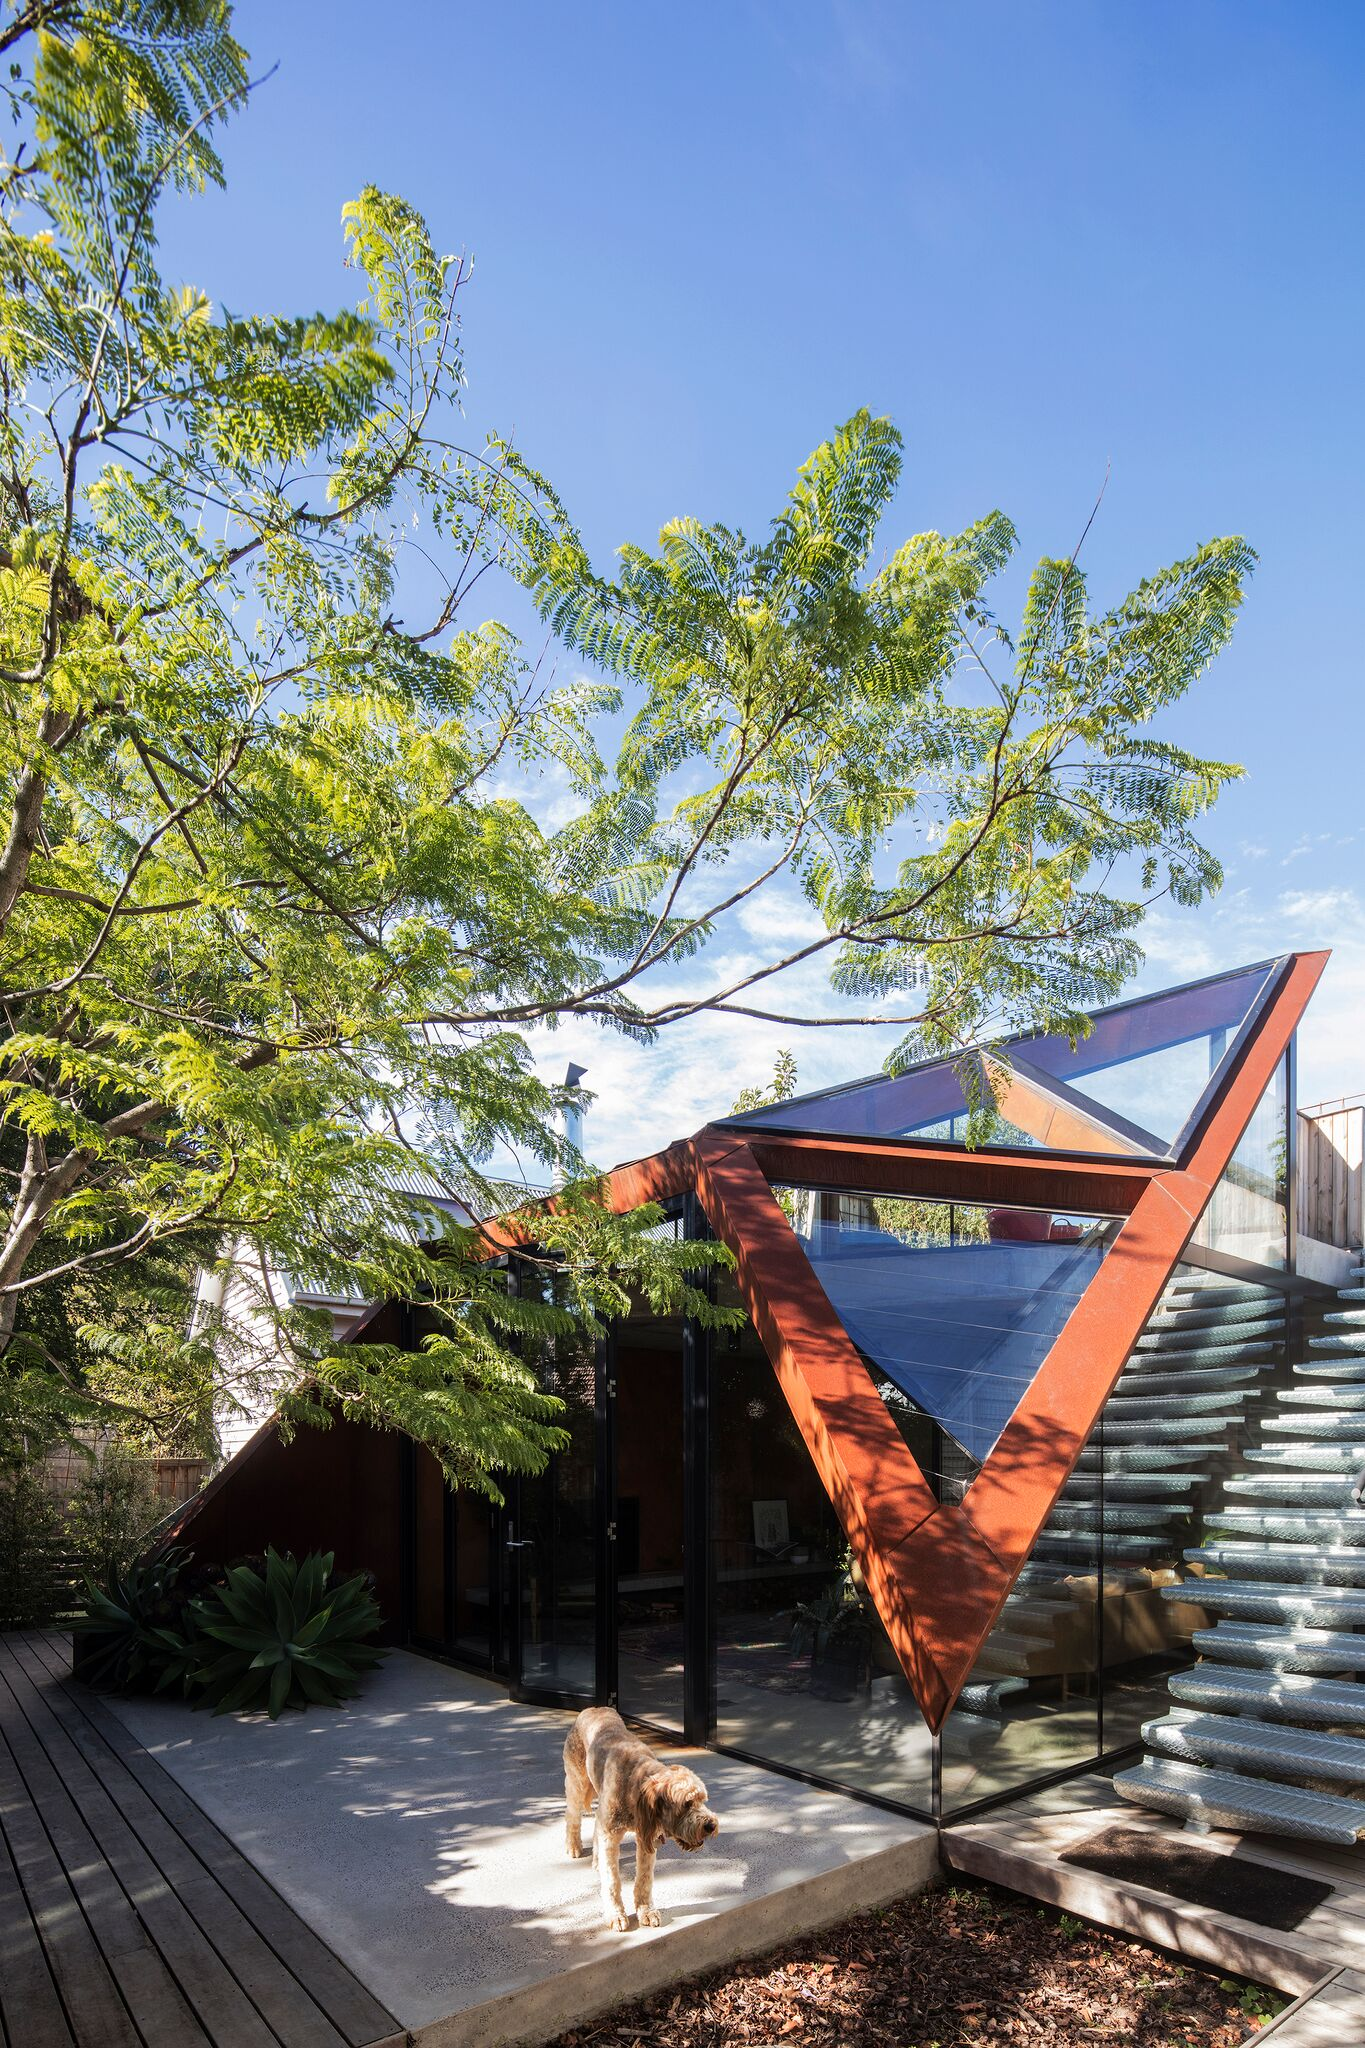 Australian Architecture - Melbourne, VIC, Australia